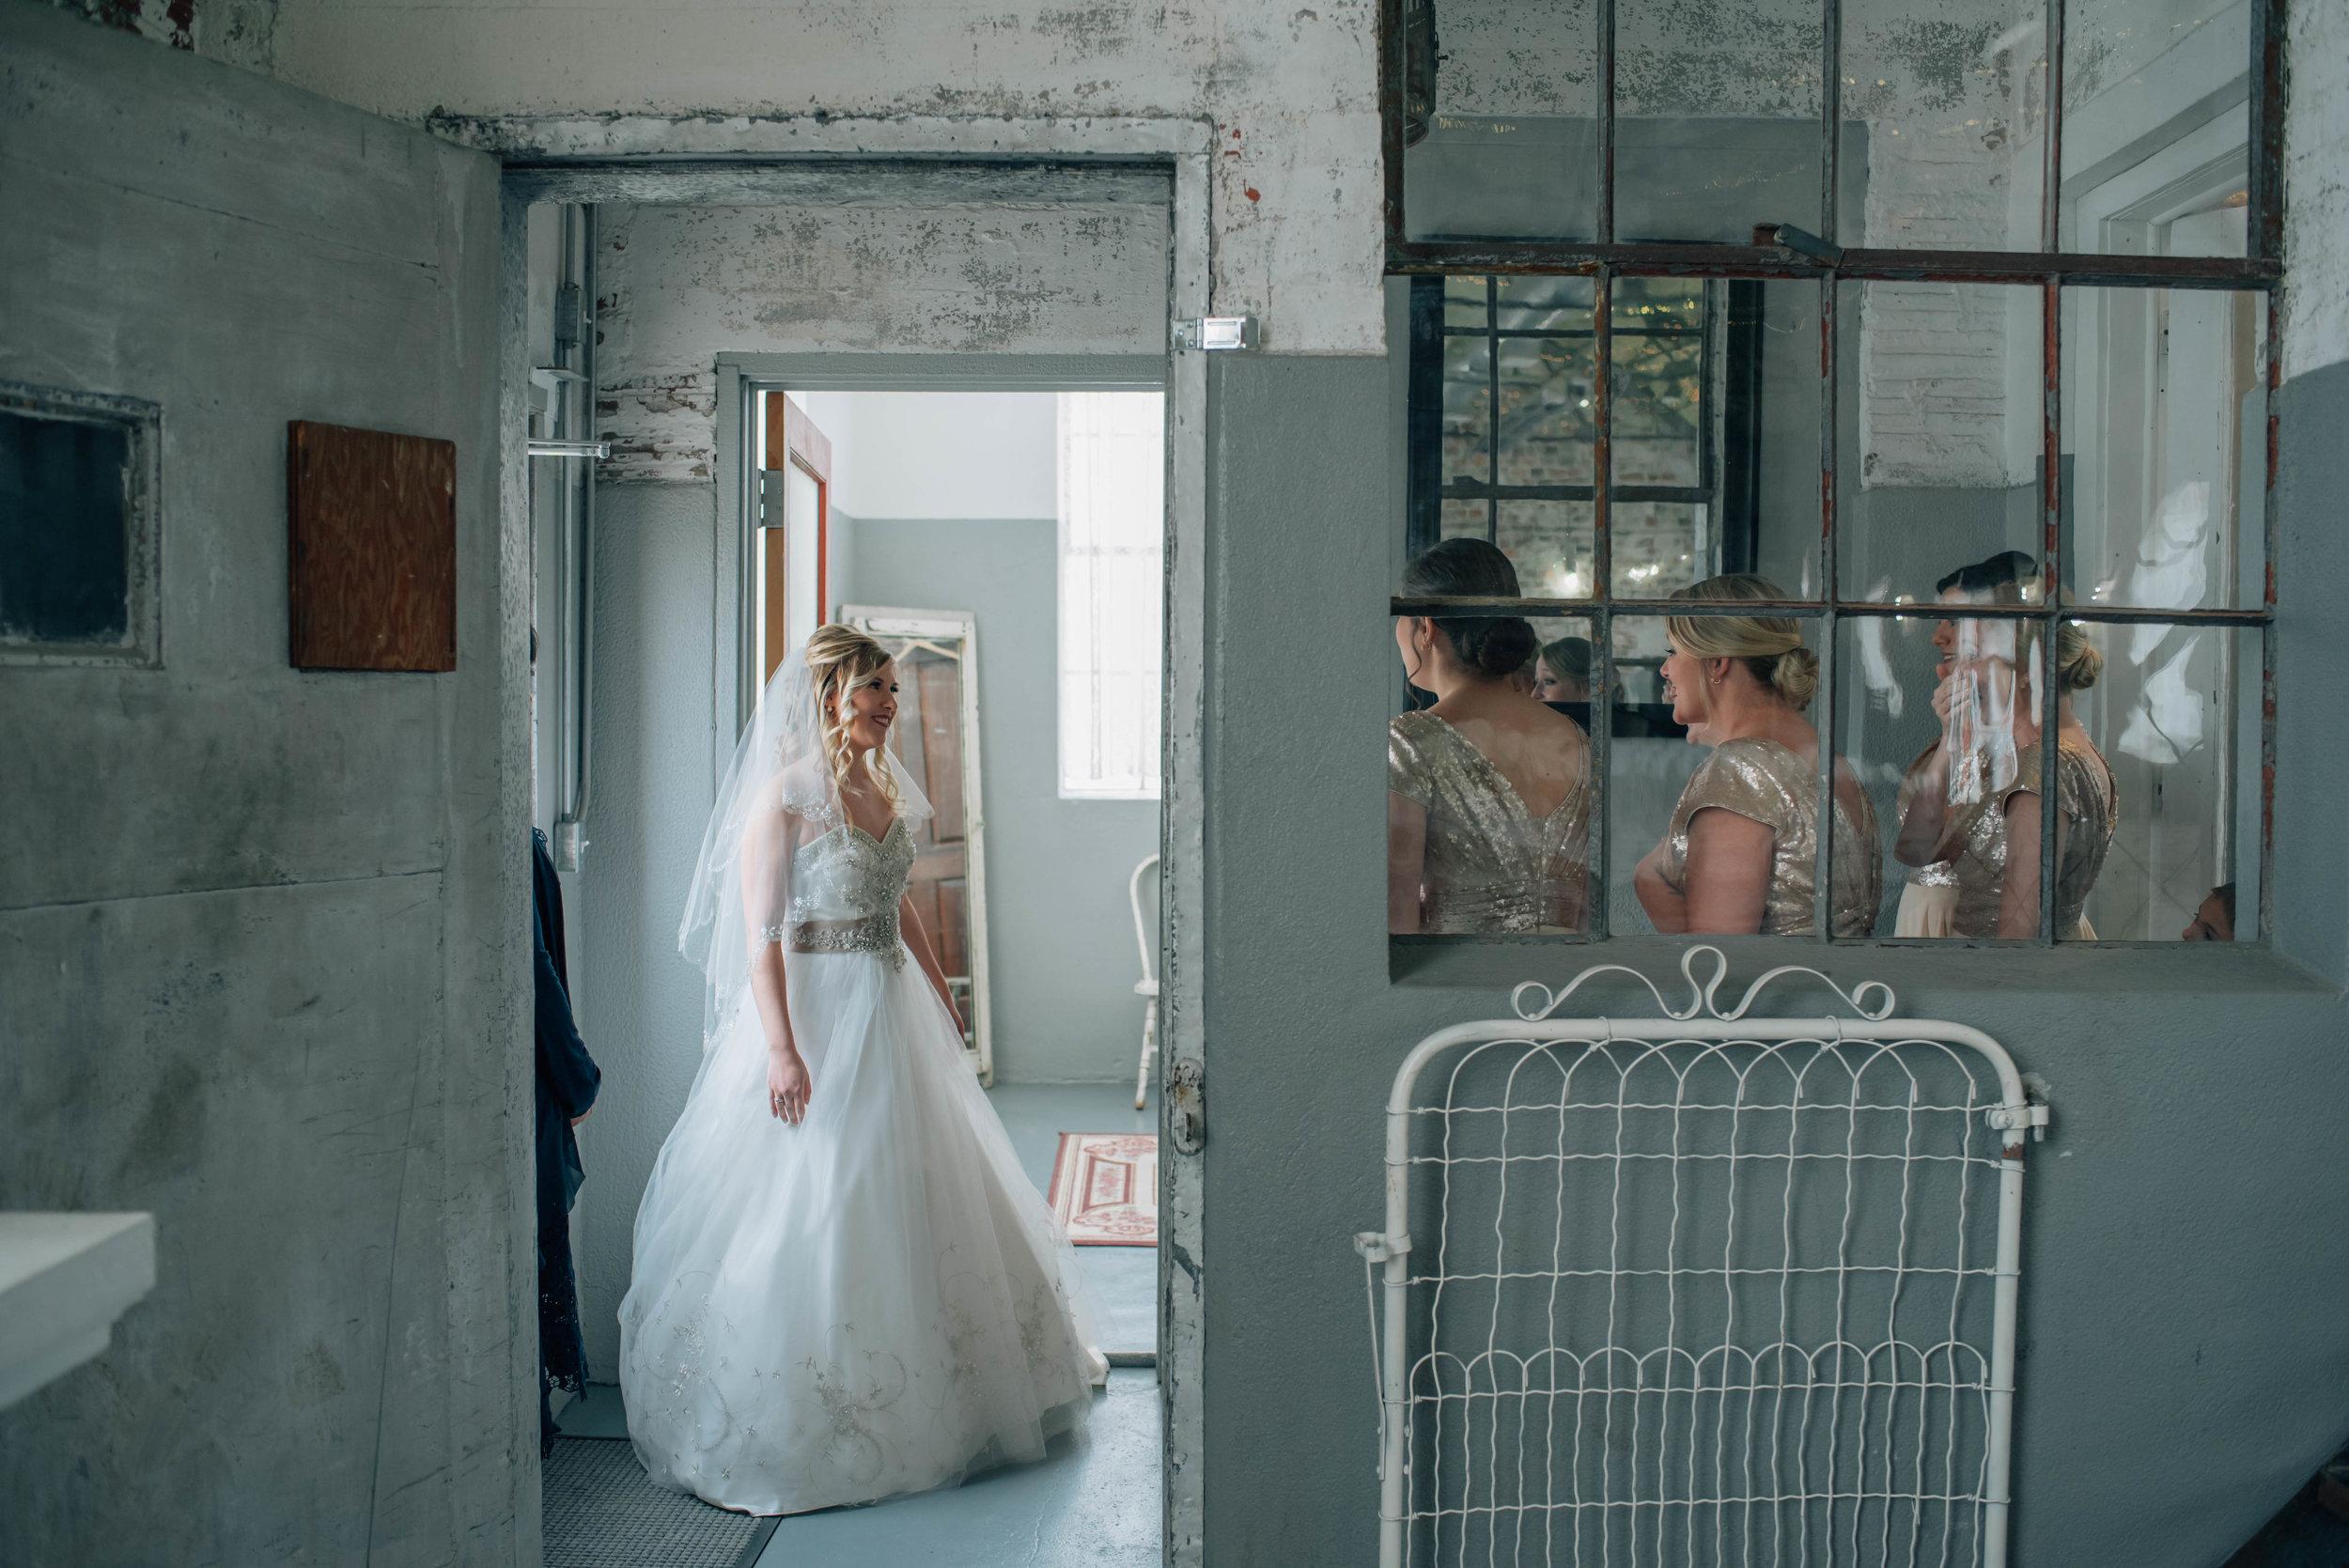 Bridal Party - Wedding Photography KCMO